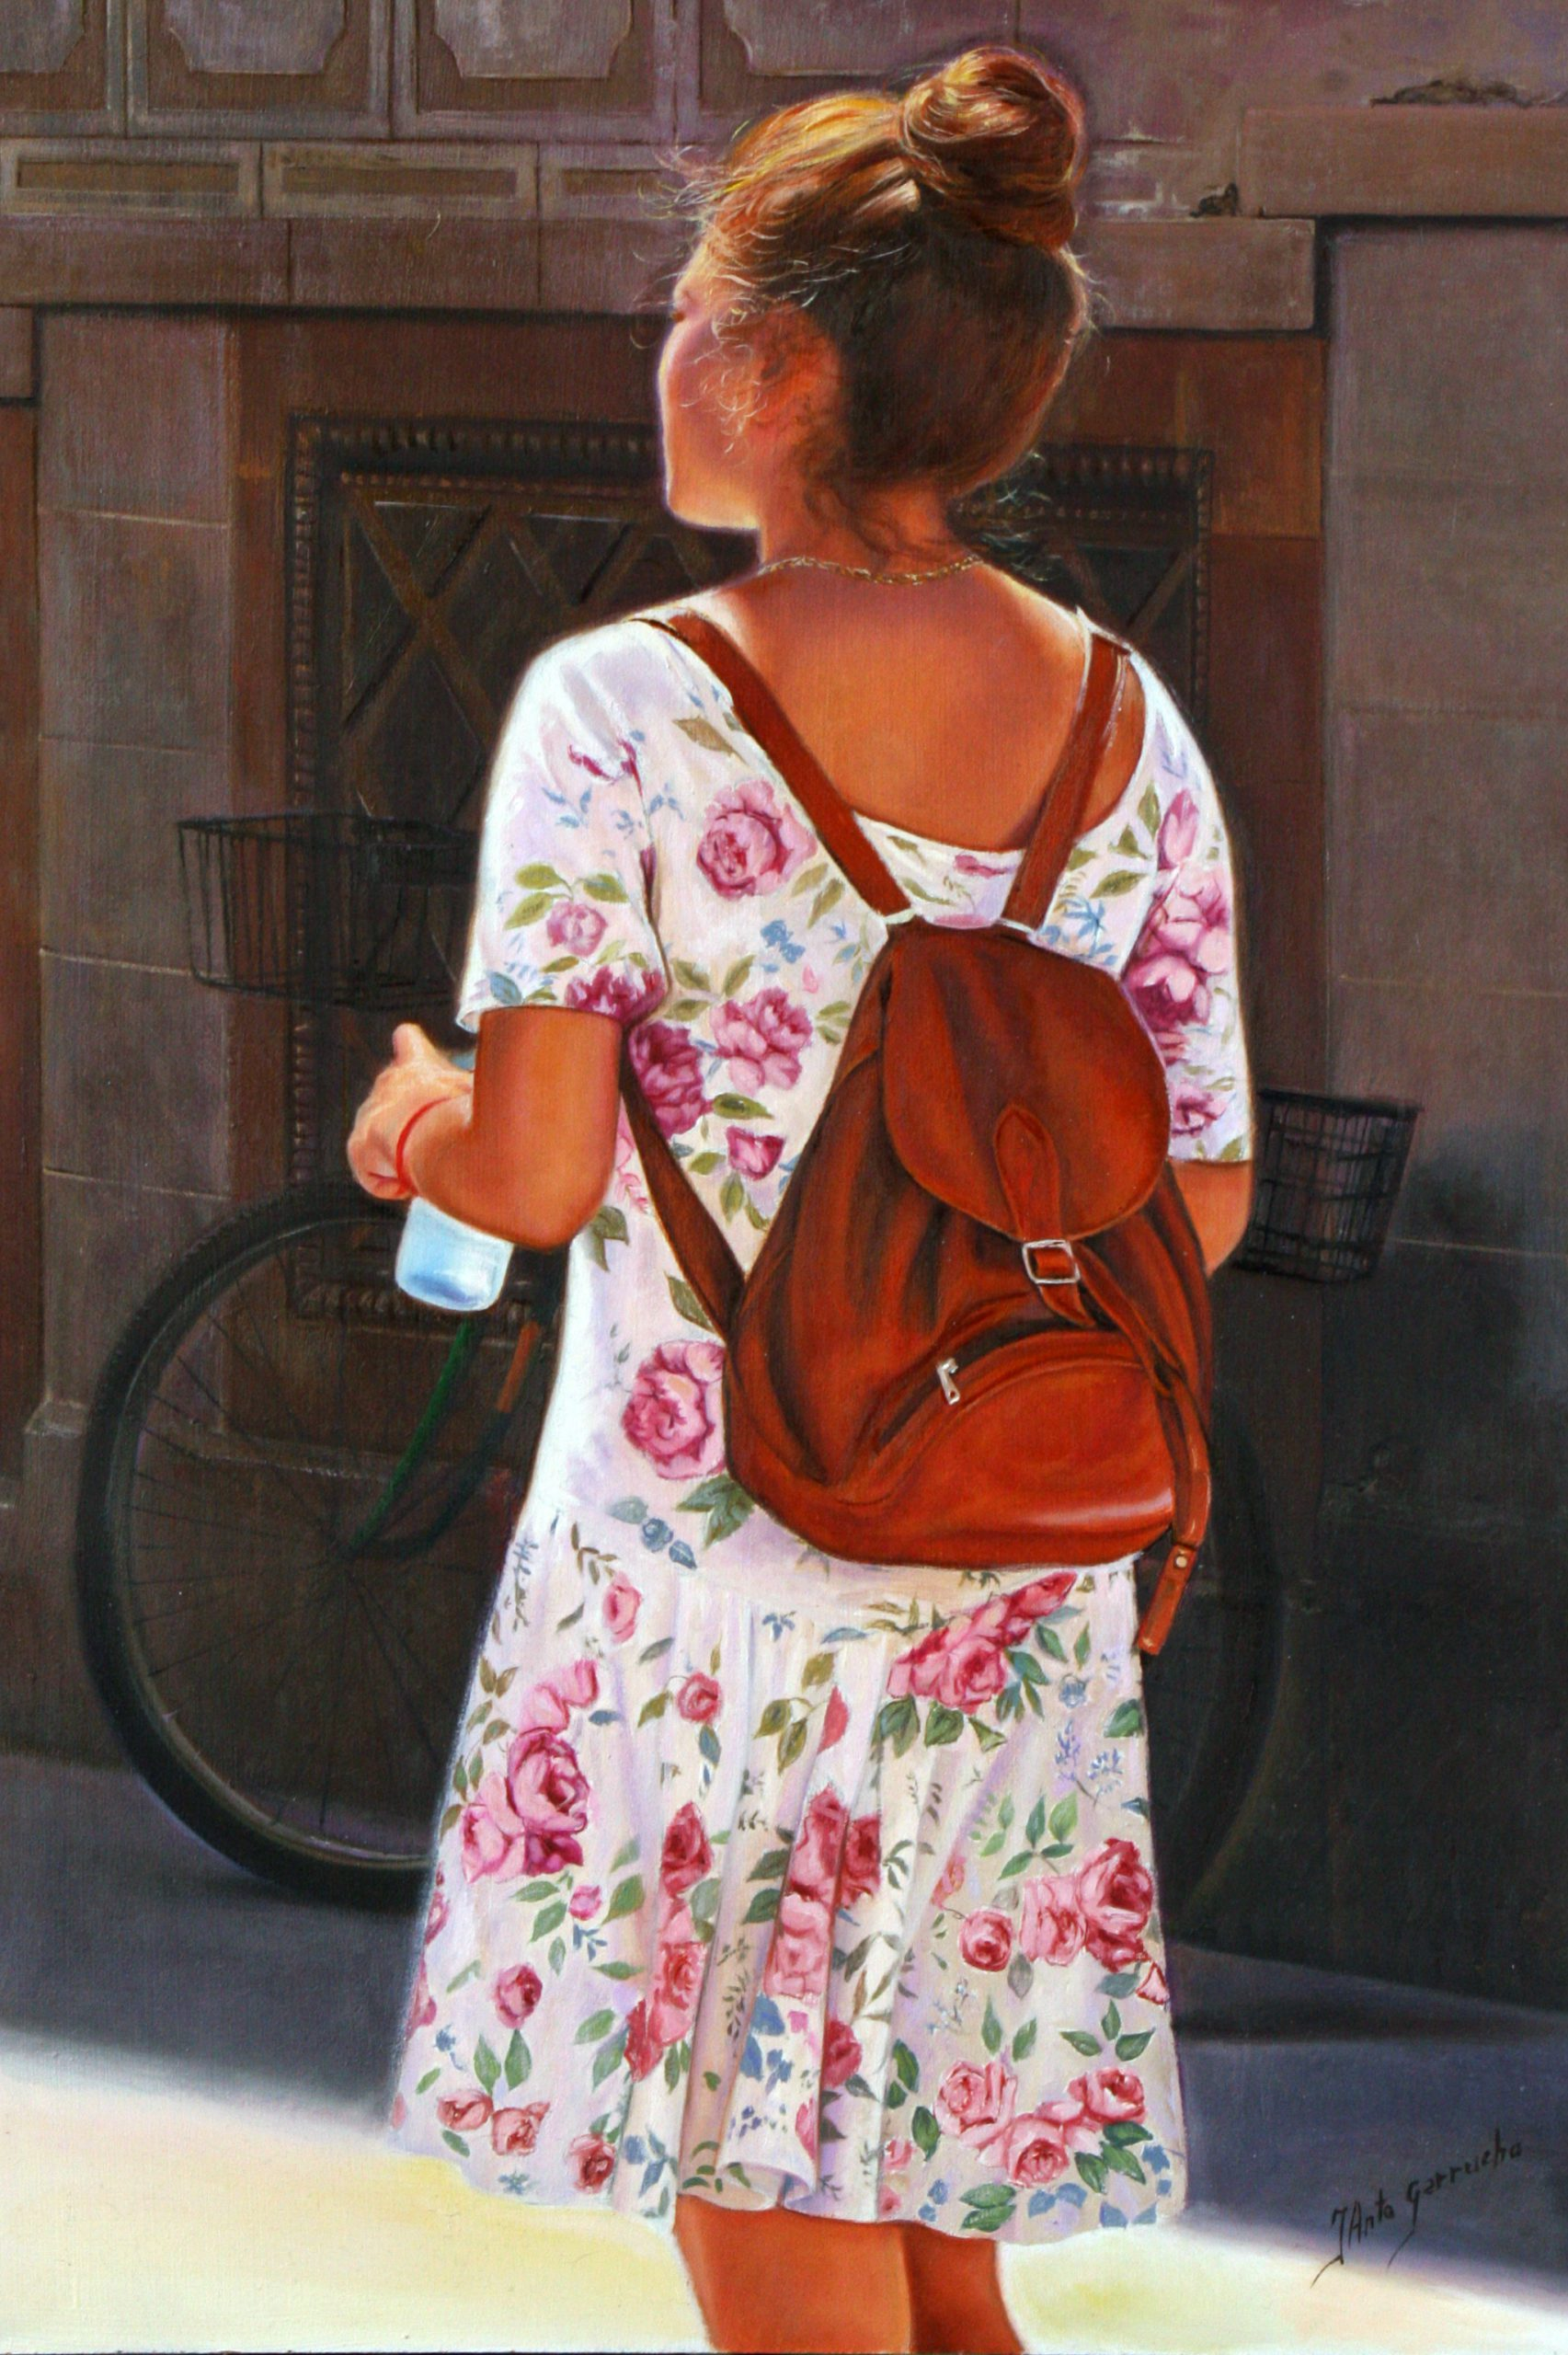 Chica con mochila de piel